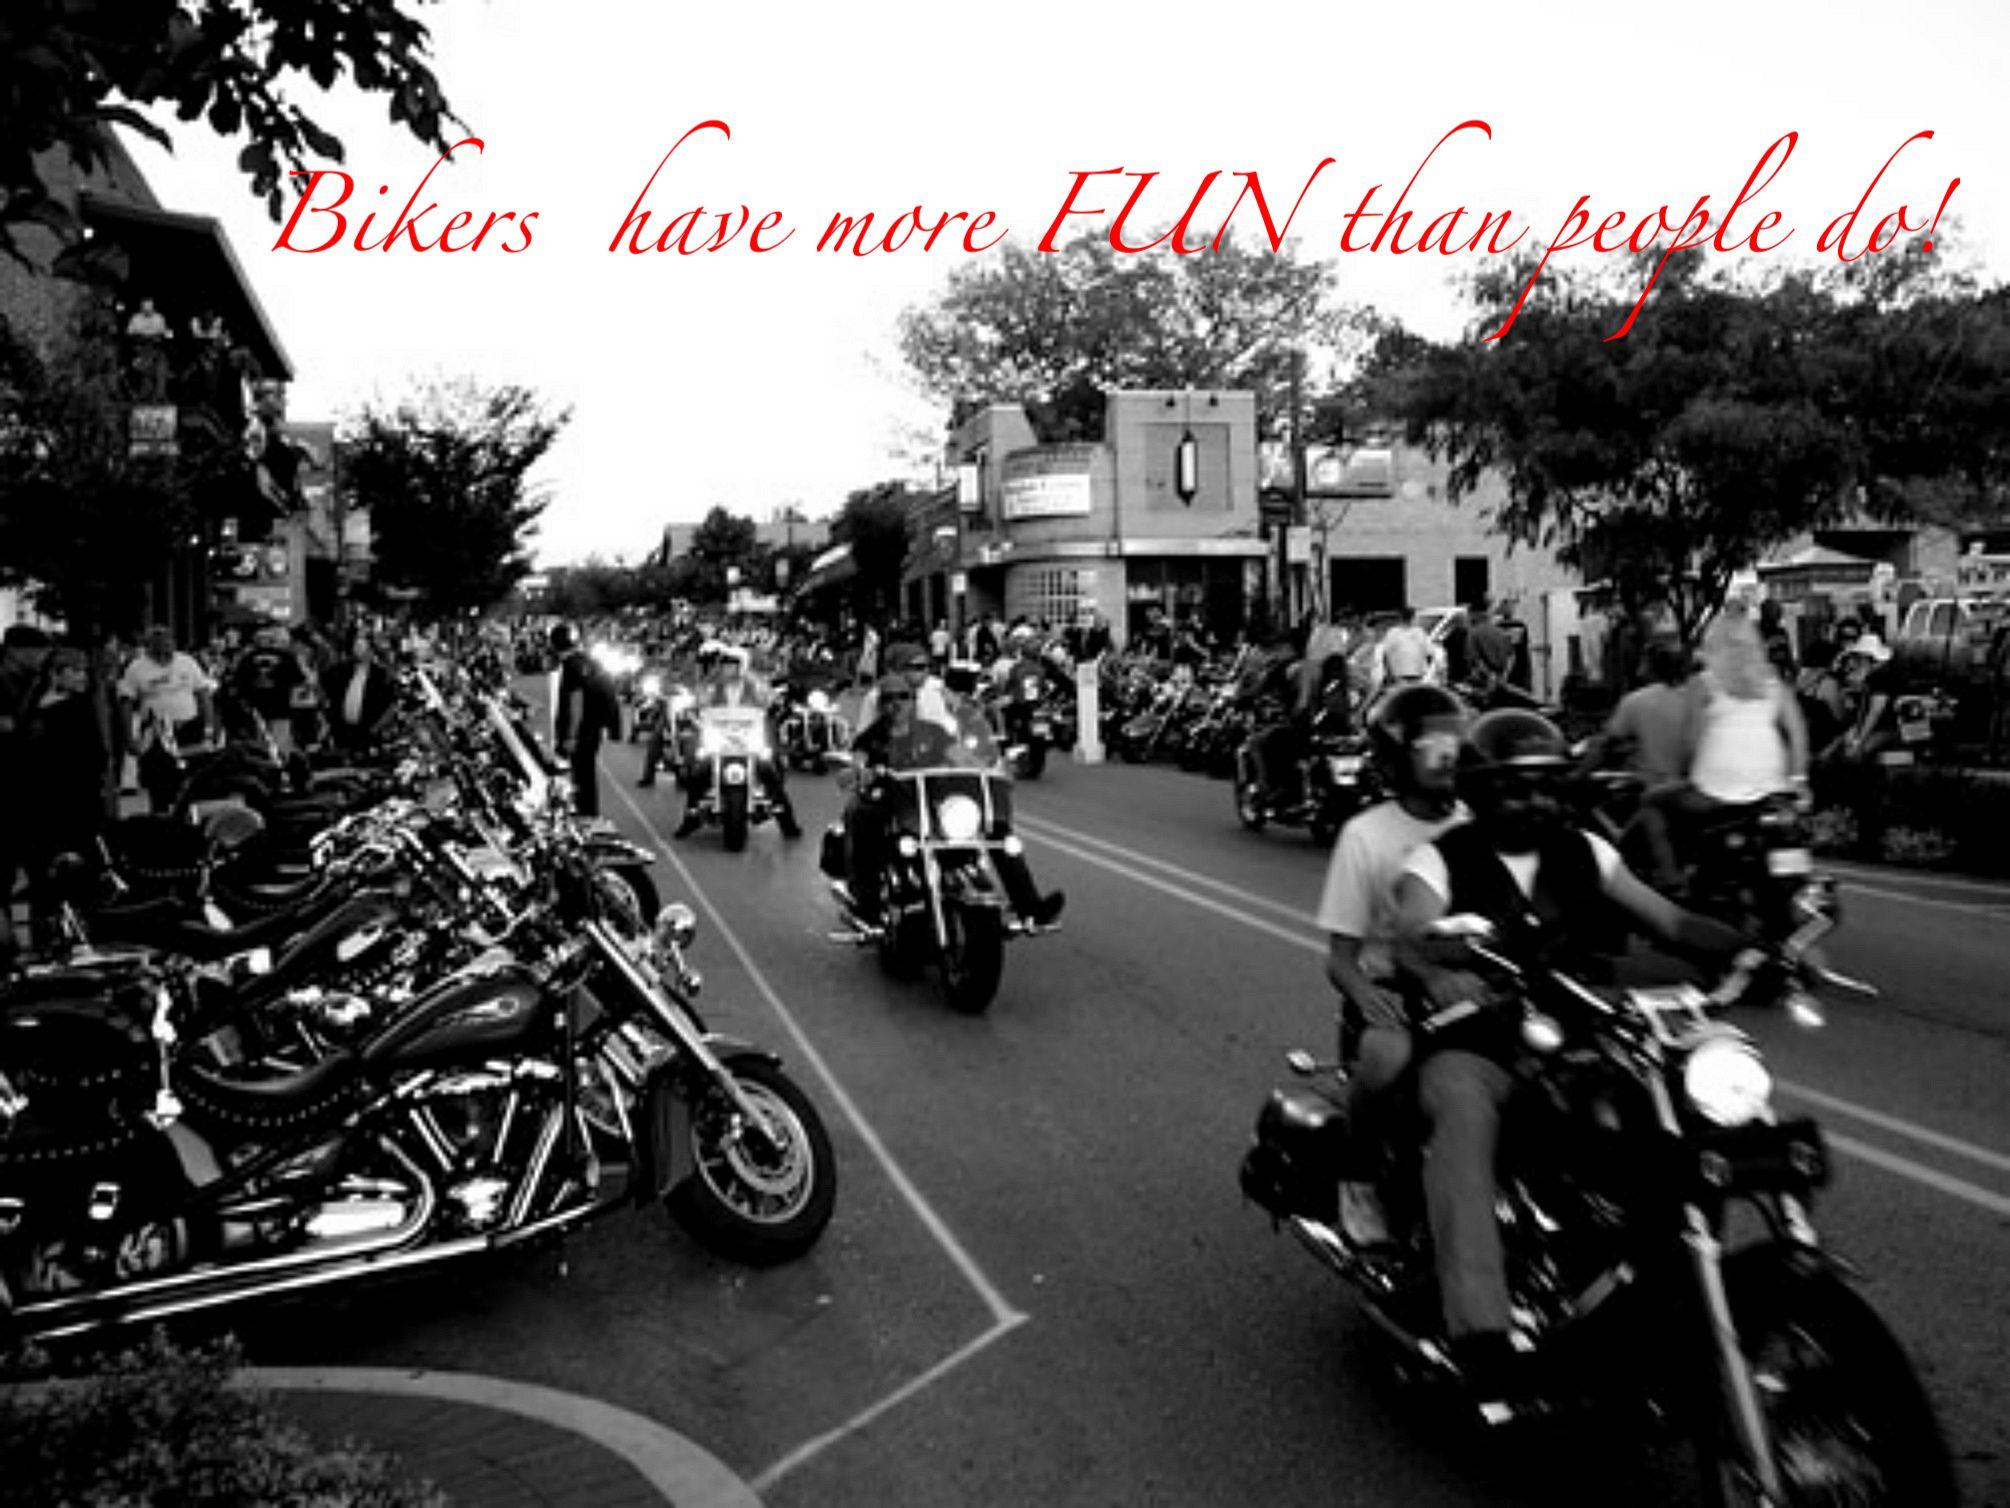 Harley Davidson Quotes Biker Fun  Biker Quotes  Pinterest  Bikers Harley Davidson And